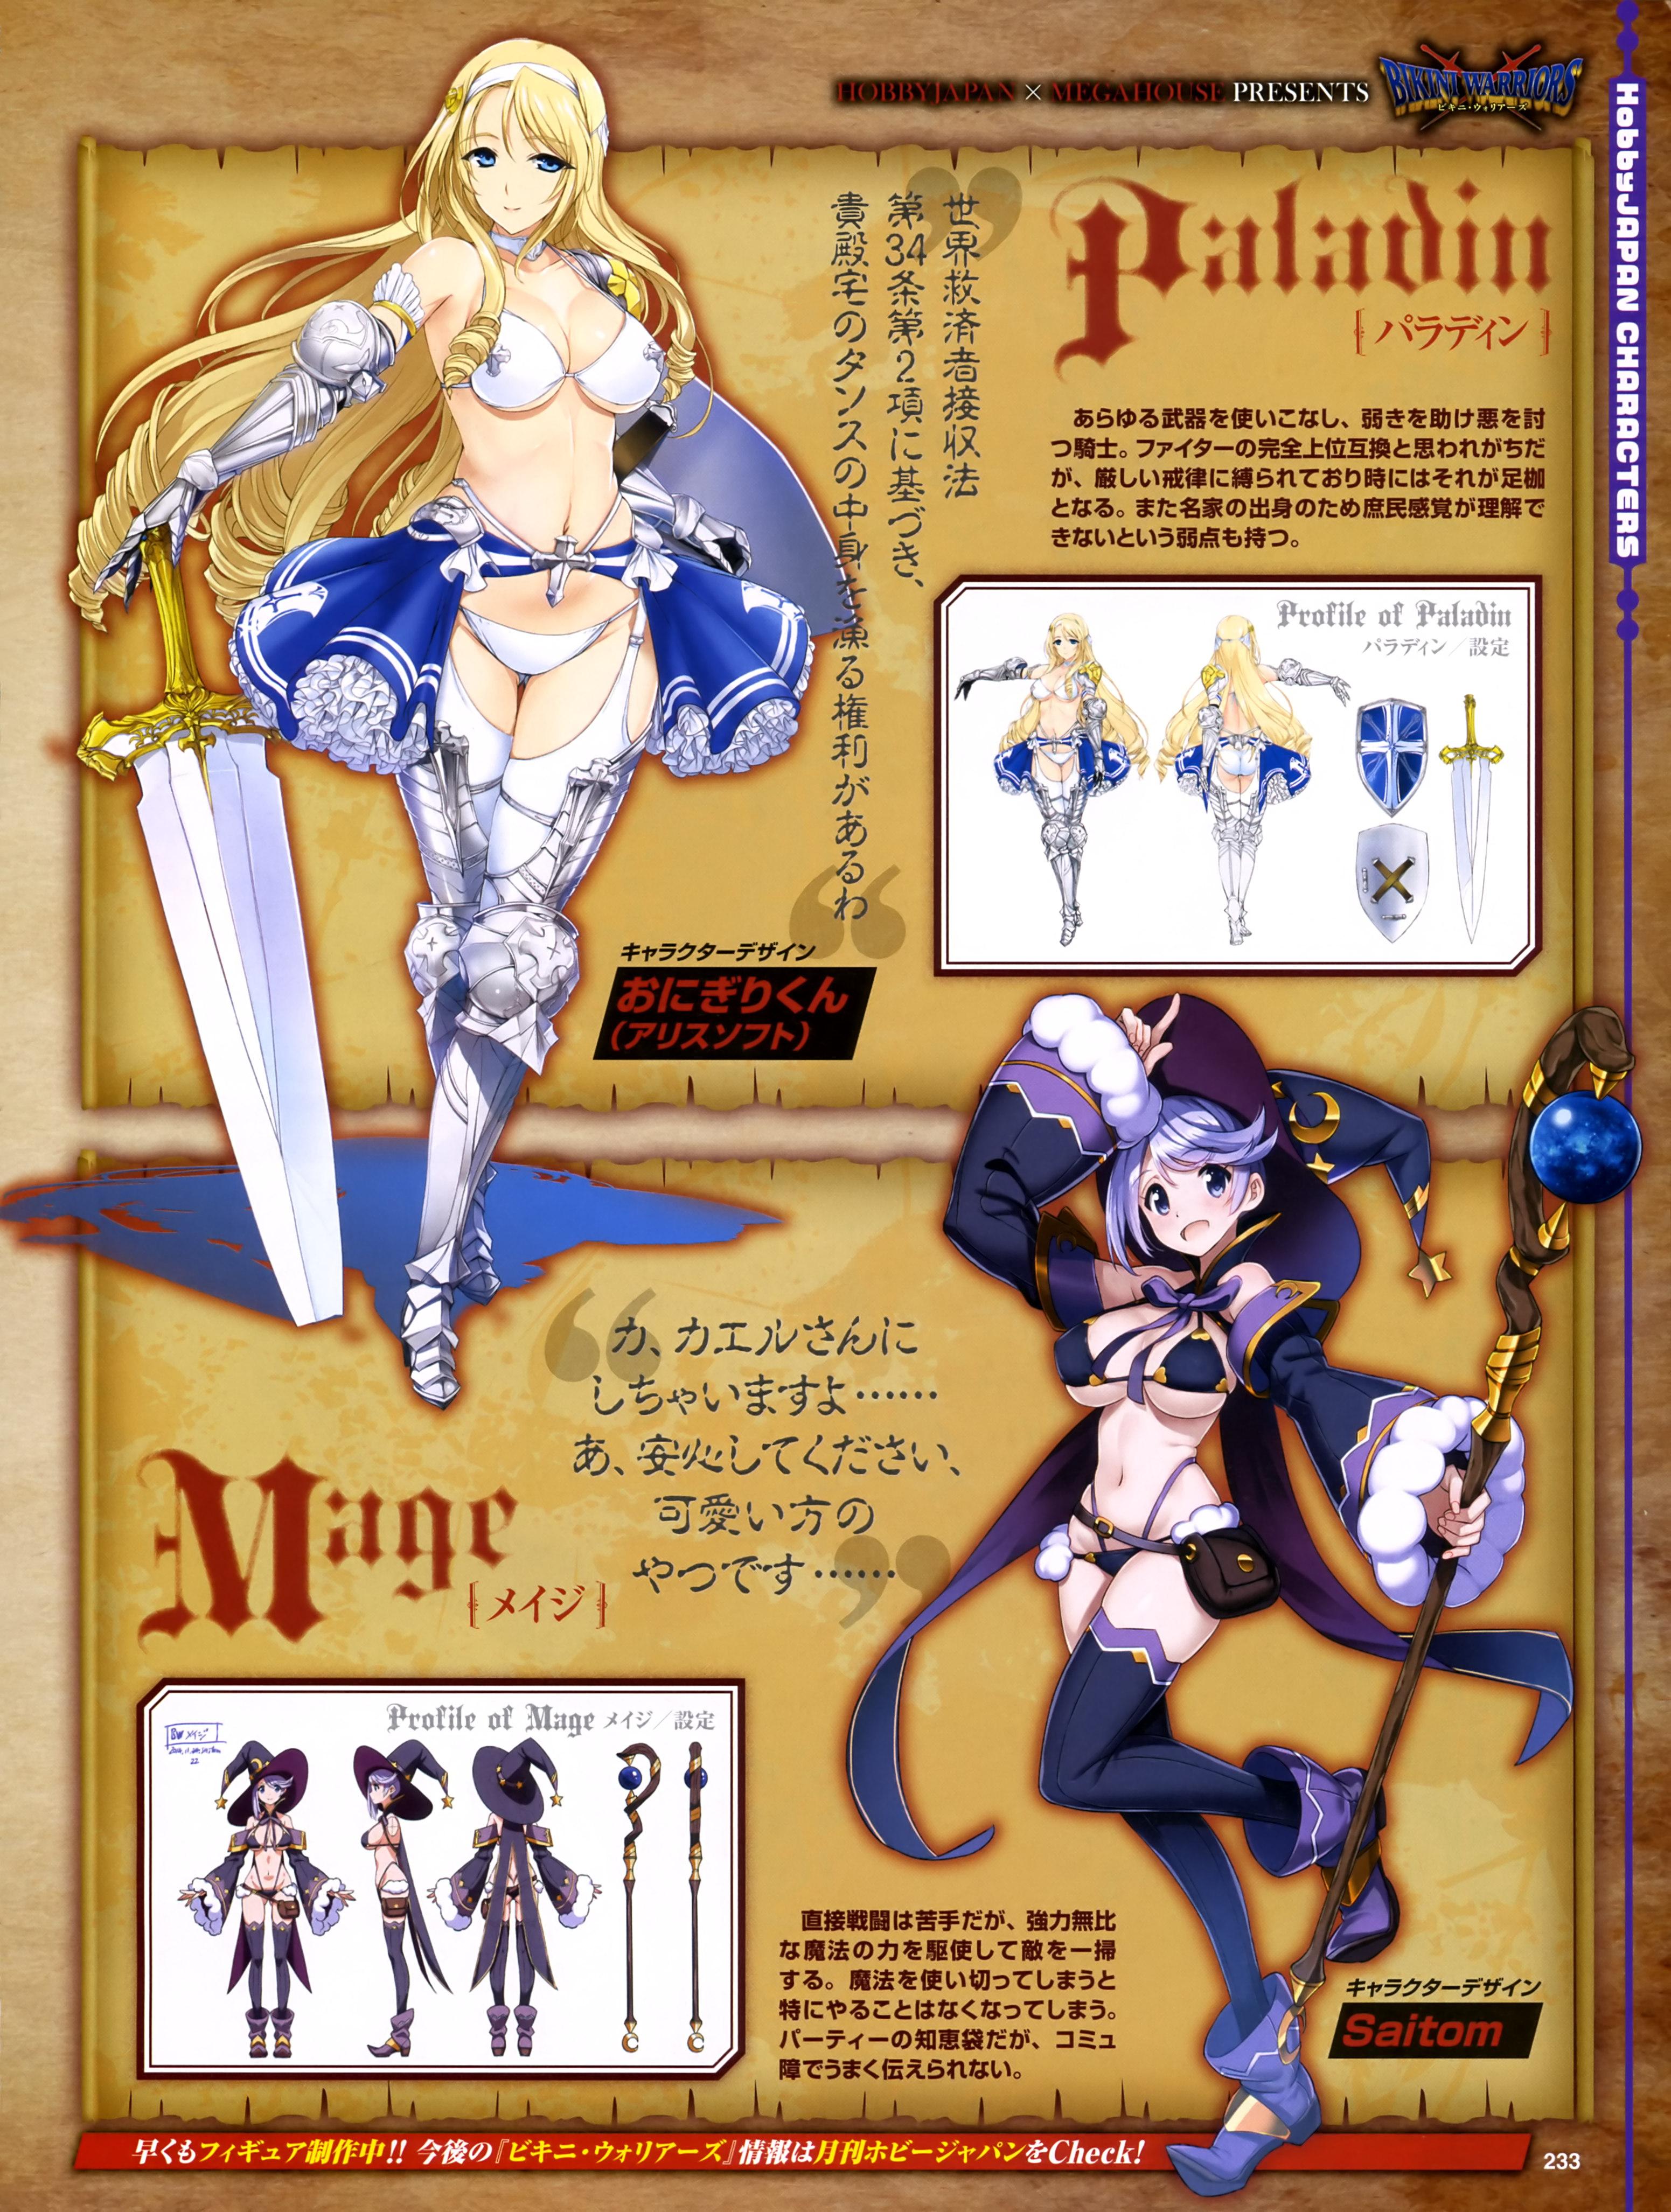 Bikini Warriors Anime Character Designs Have Major Plot 2